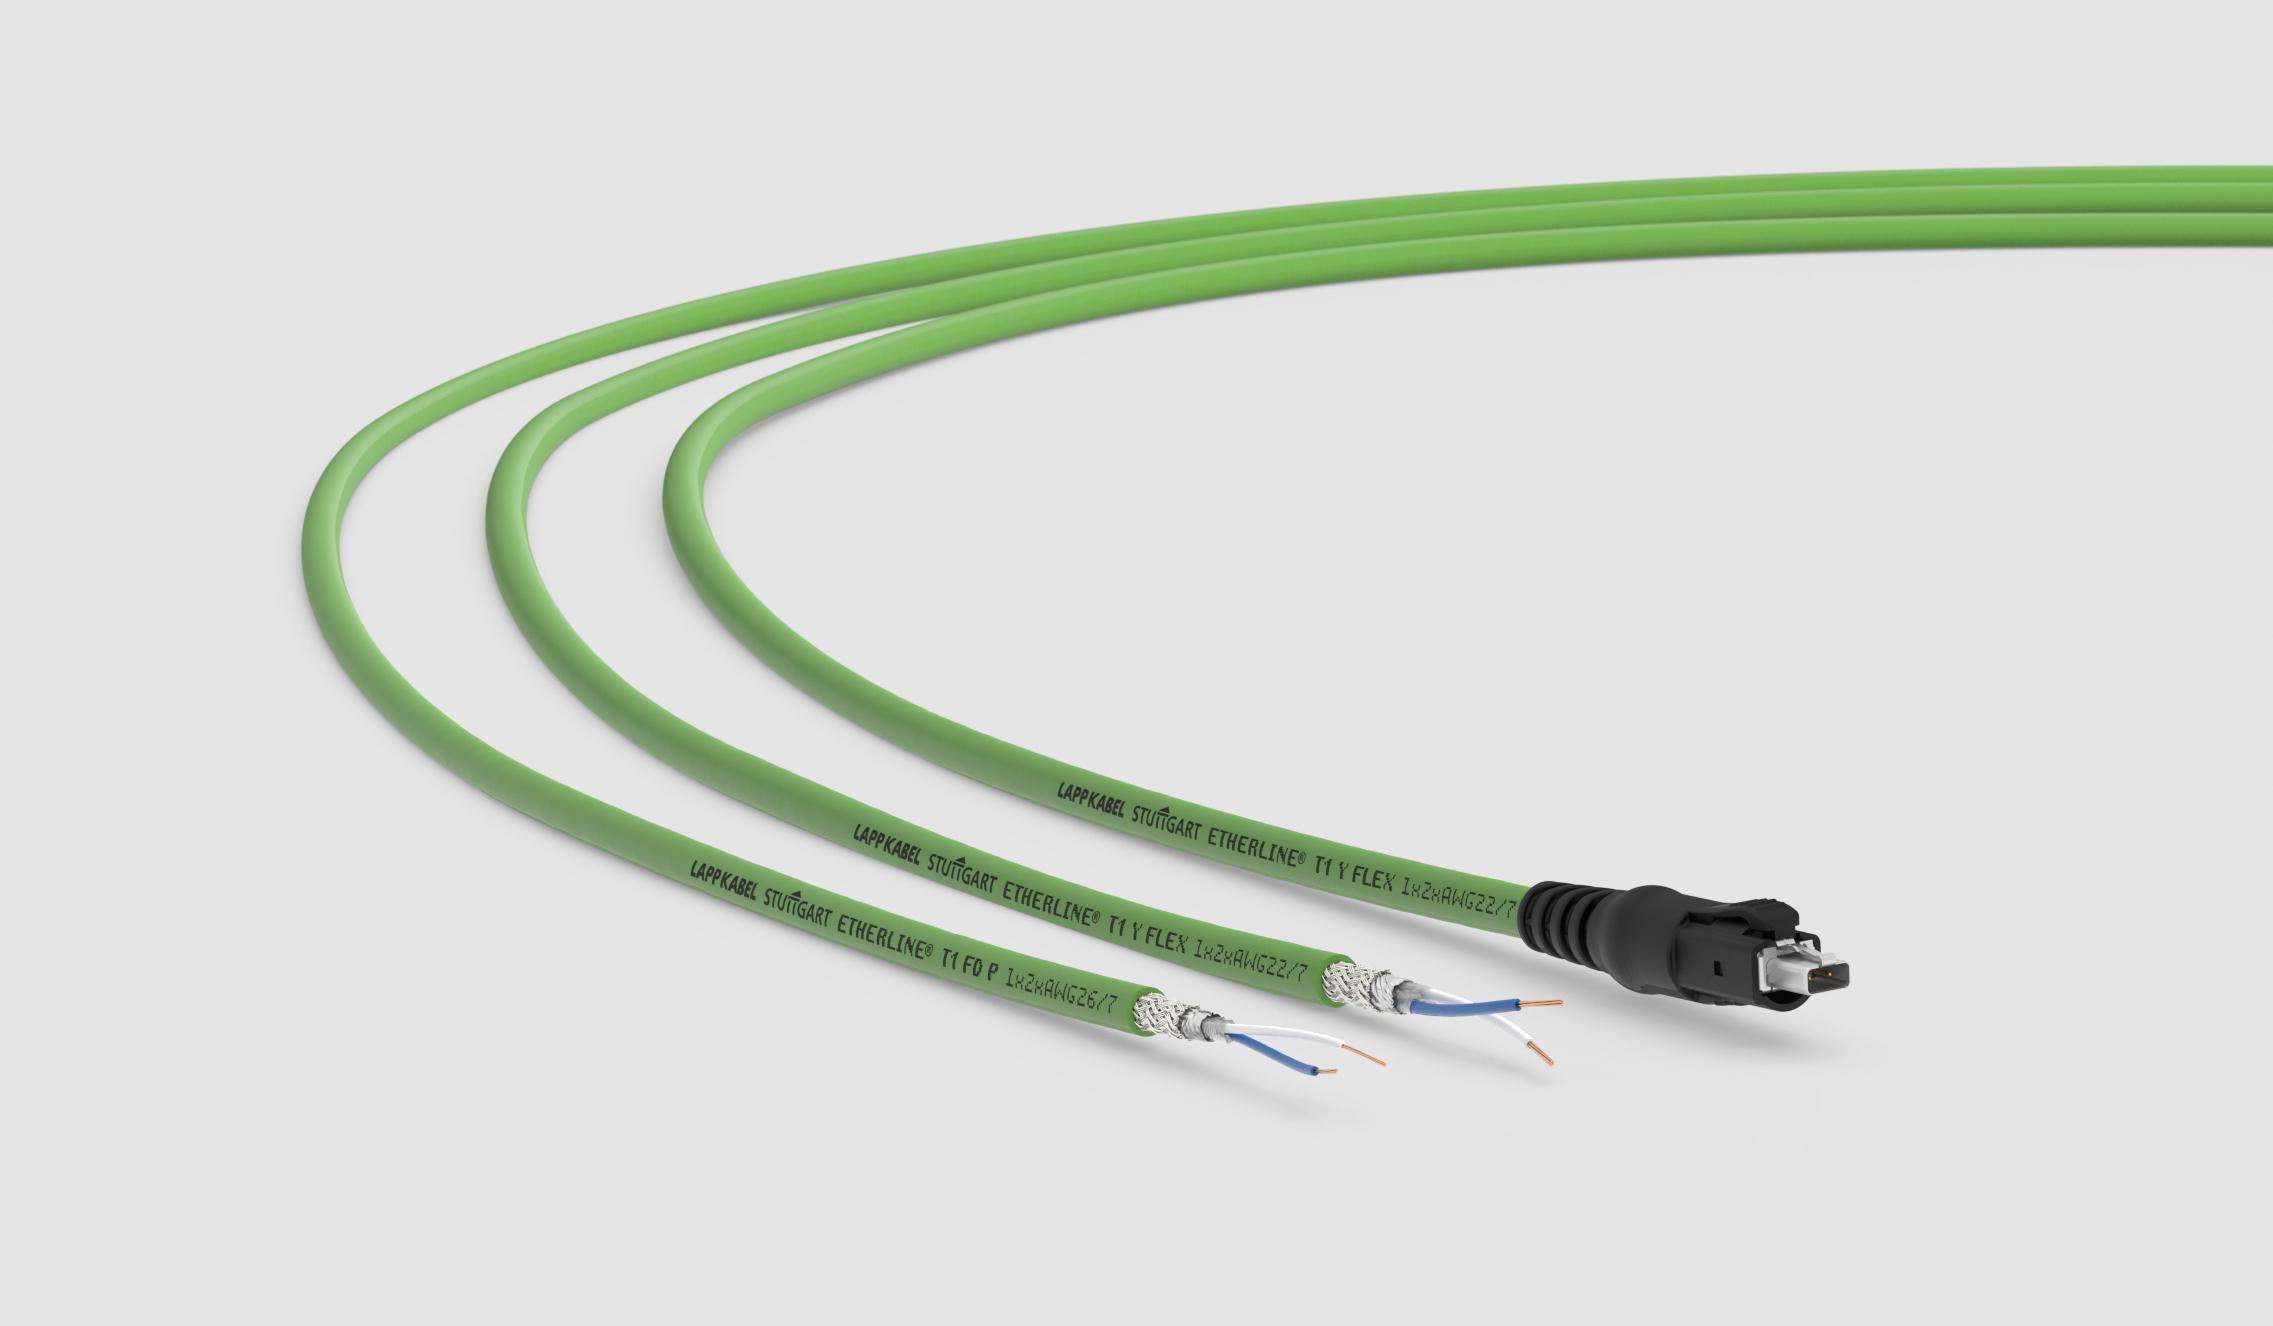 Single-pair Ethernet, tehnologia cheie pentru Industria 4.0